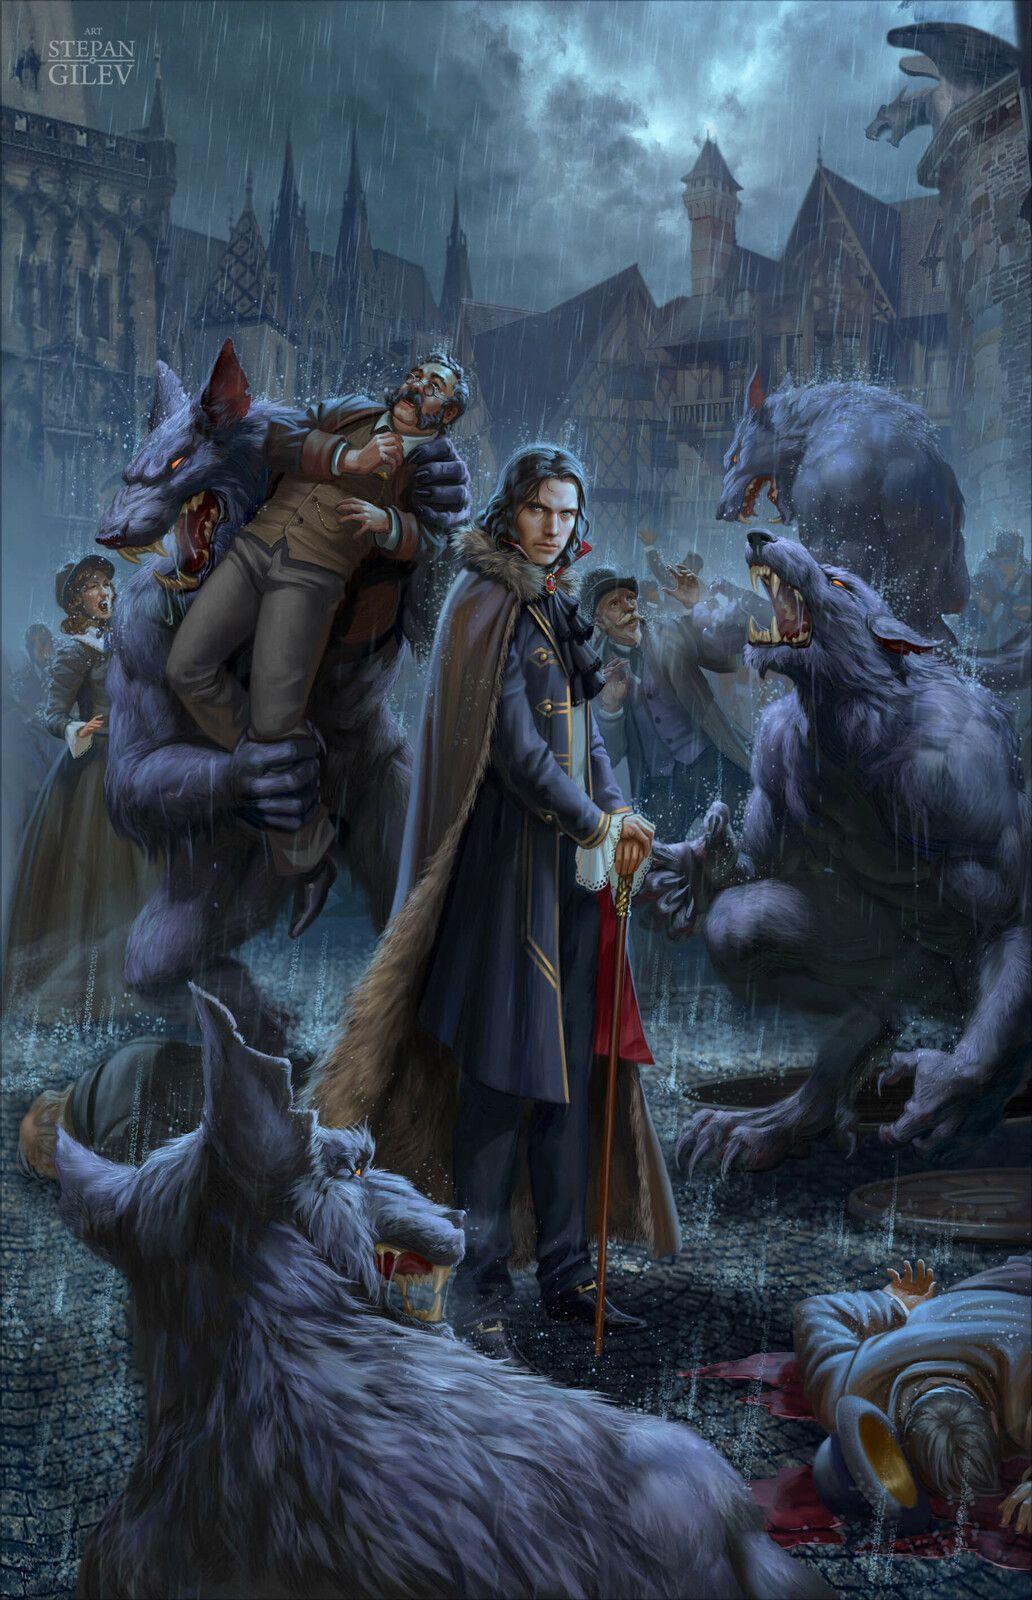 ArtStation Werewolves. Оборотни., Stepan Gilev in 2020